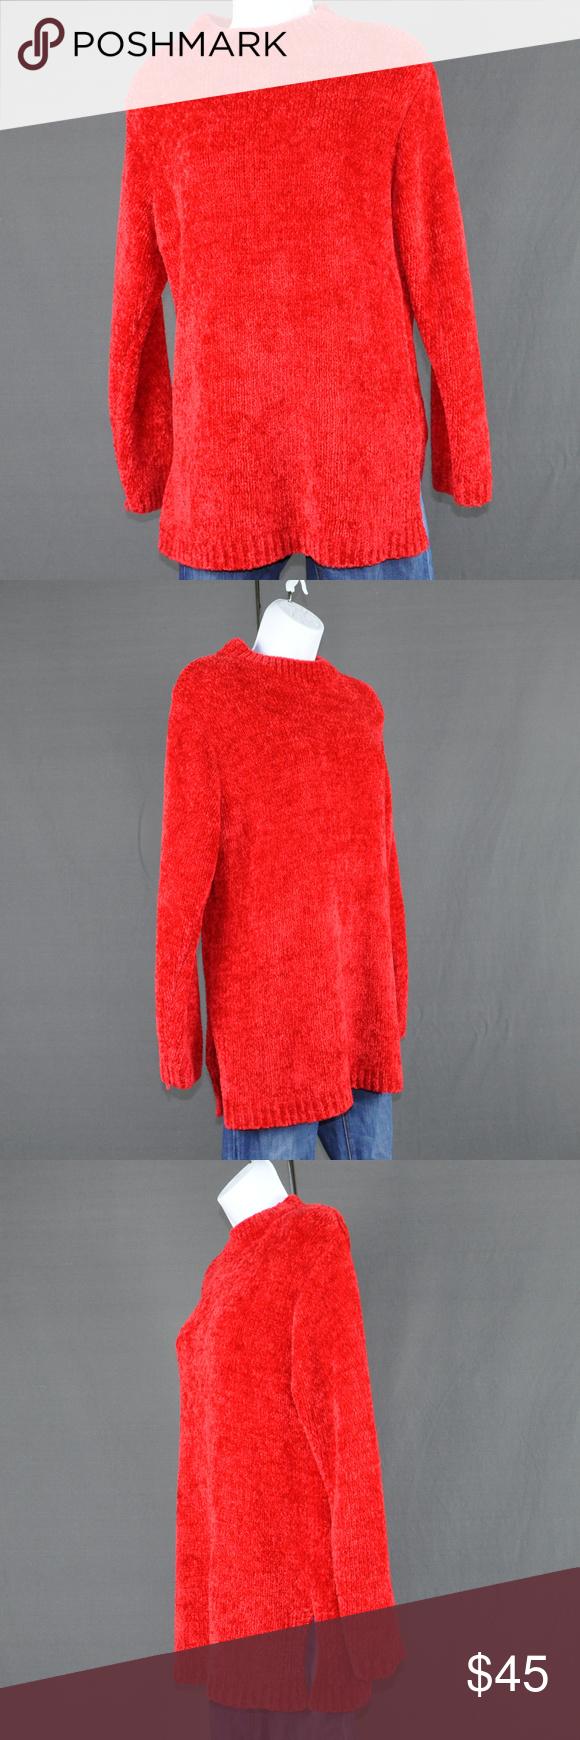 Yarnworks Soft & Fuzzy Red Tunic Sweater Sz: M | Red tunic, Tunic ...